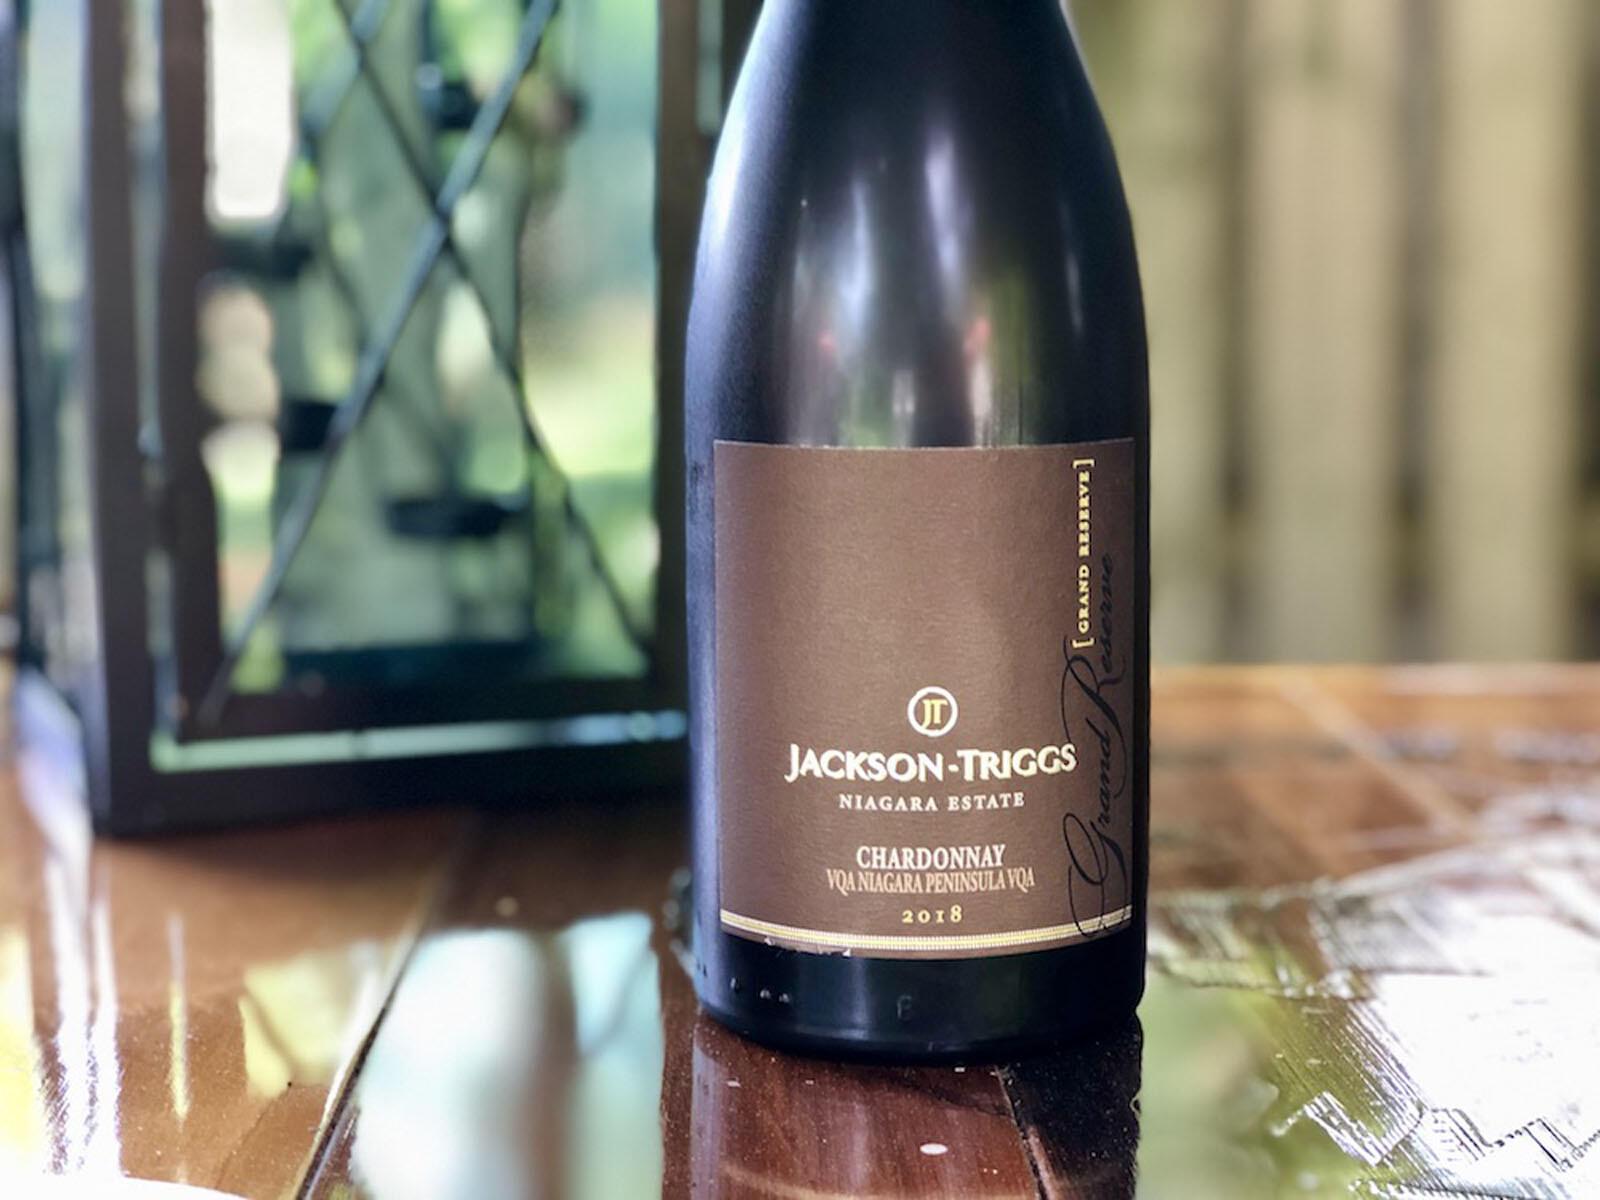 elegant vine bottle on a table at The Inn of Waterloo